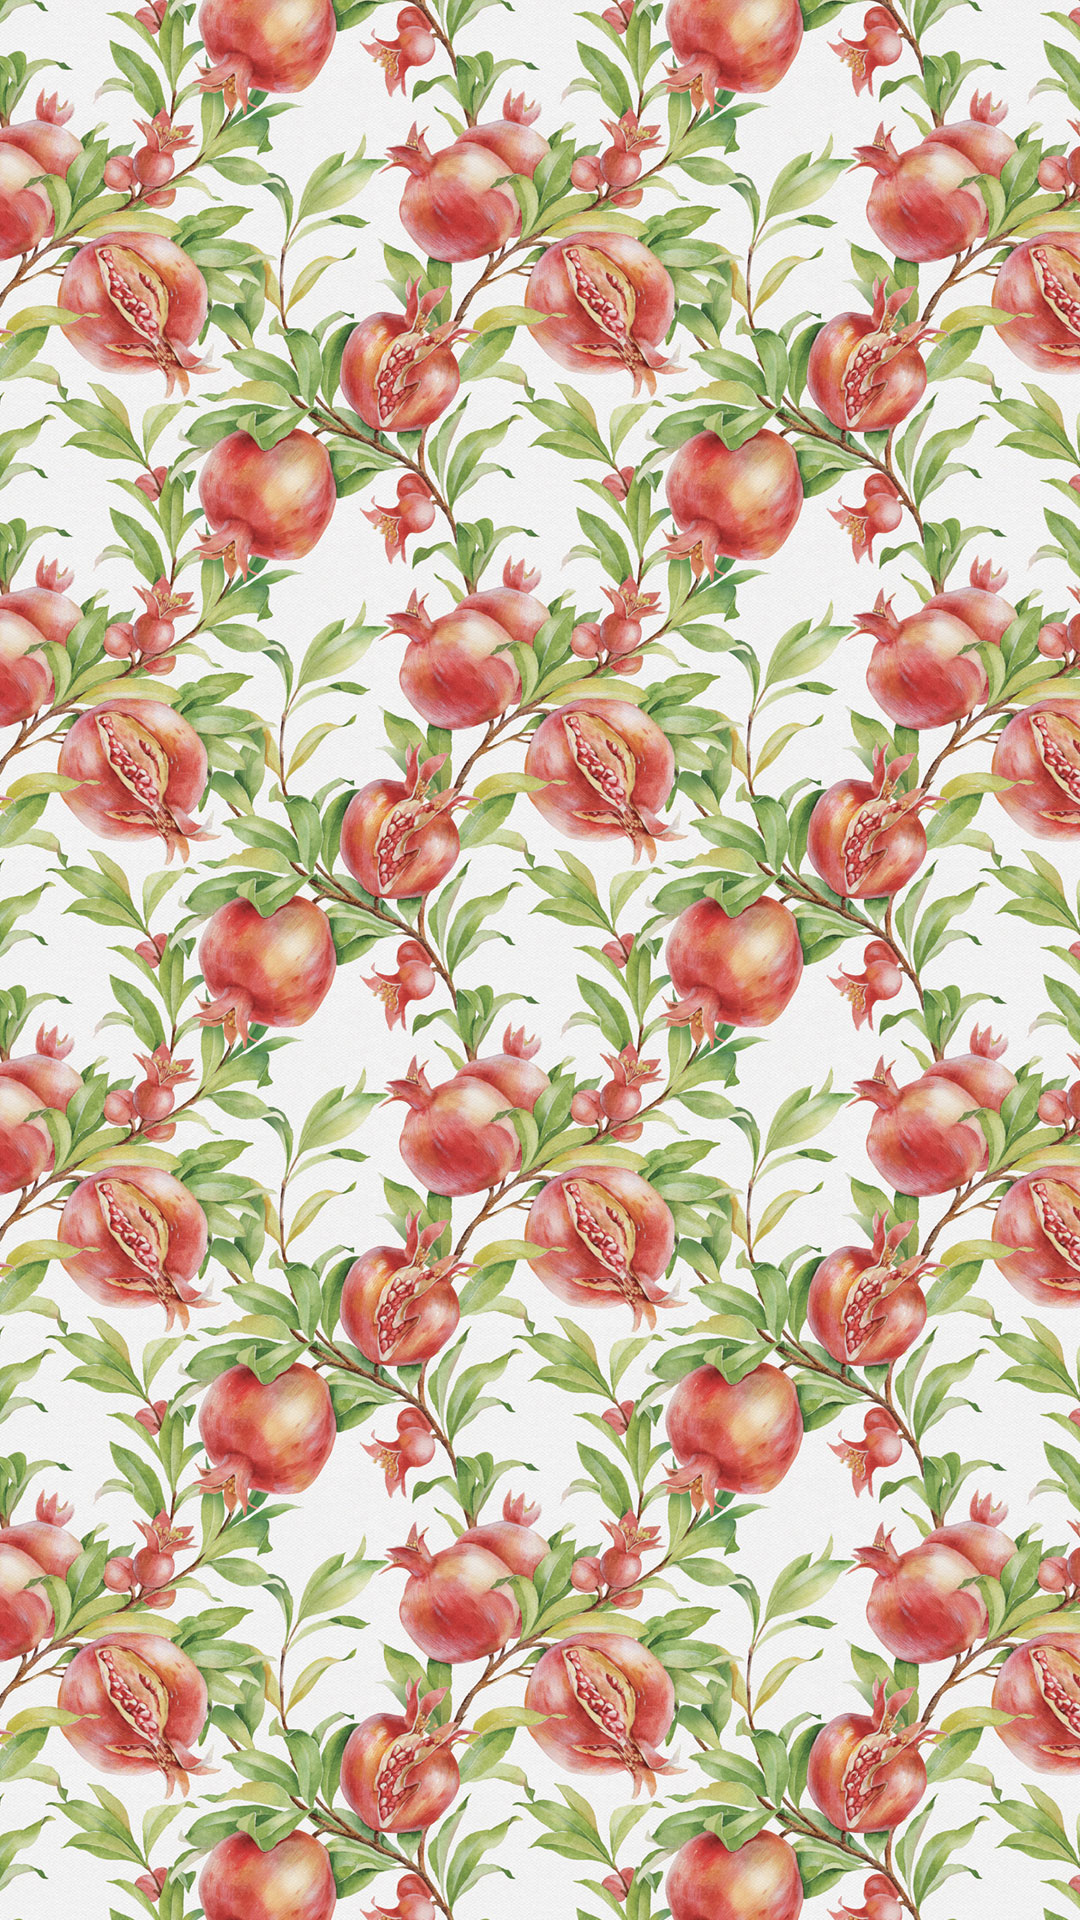 20+ Cool & Beautiful IPhone 7 Plus Wallpapers